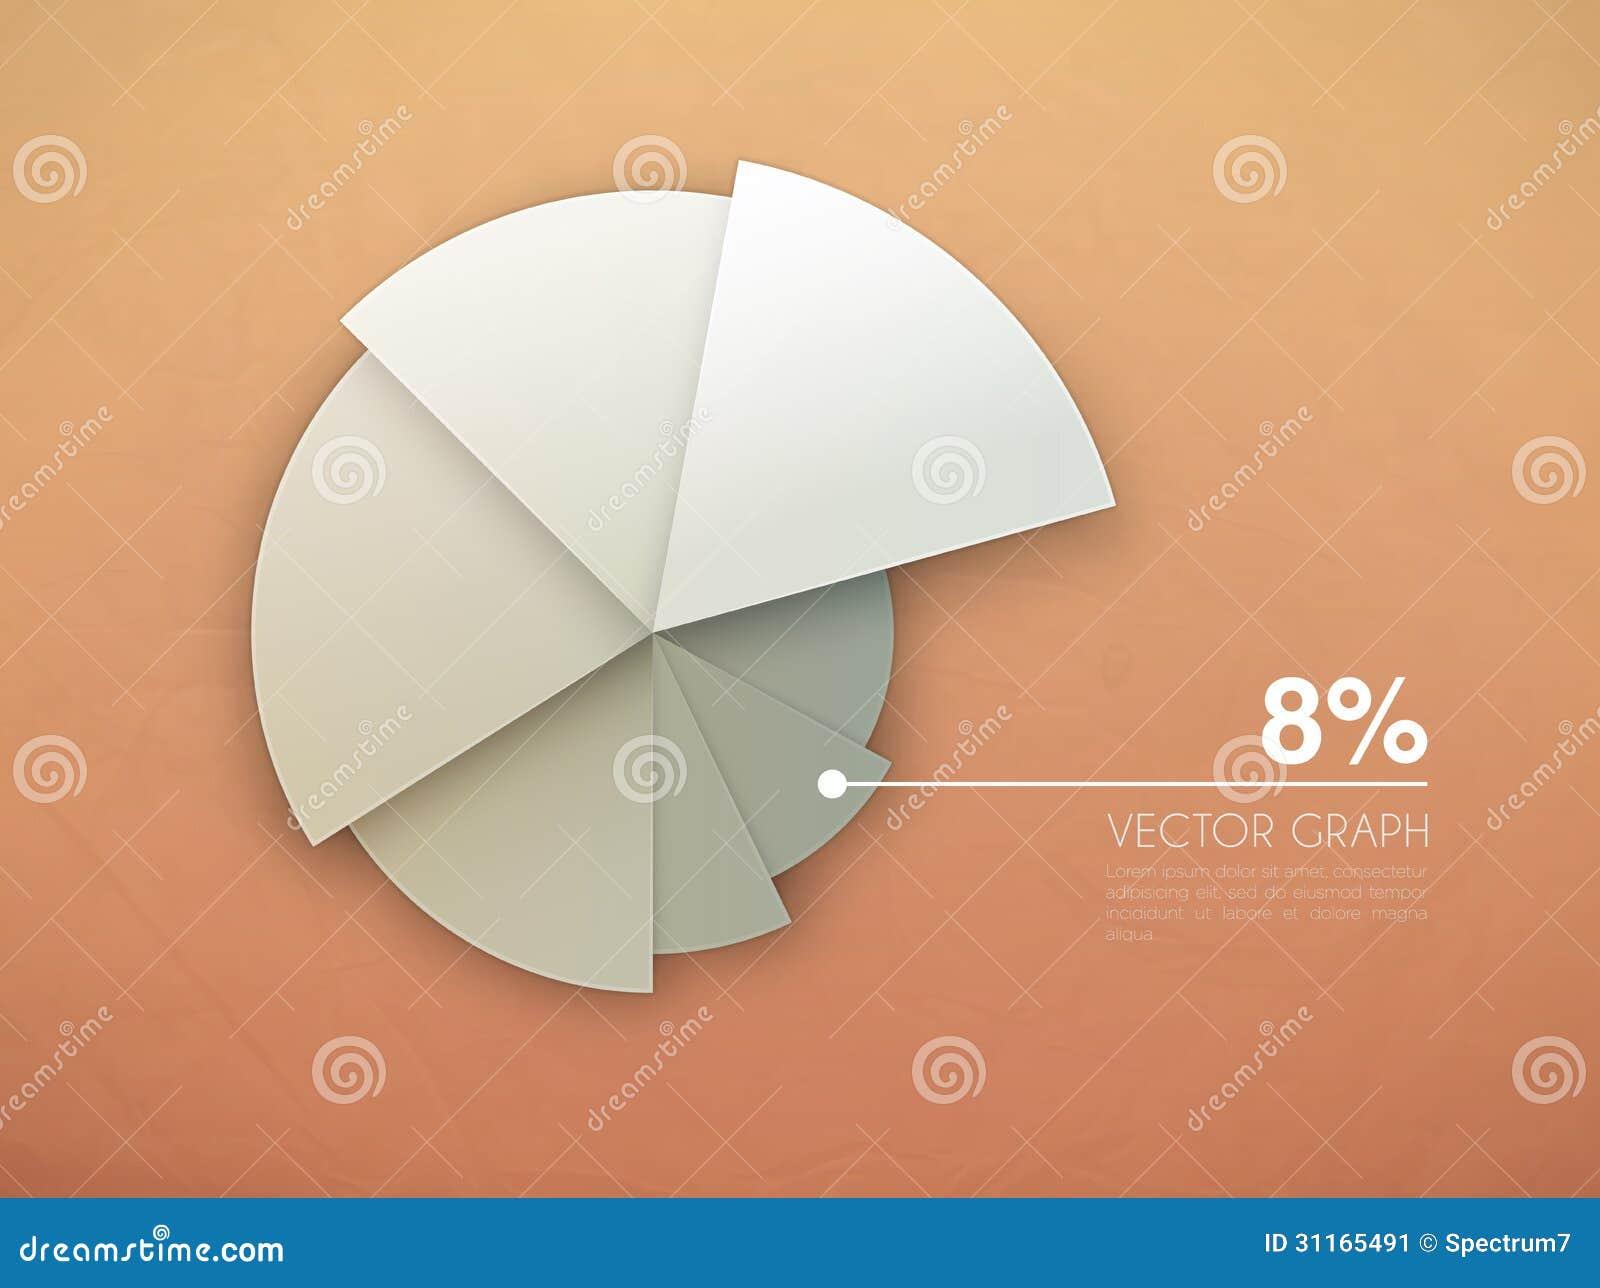 Graph diagram vector pie chart stock vector illustration of graph diagram vector pie chart geenschuldenfo Images